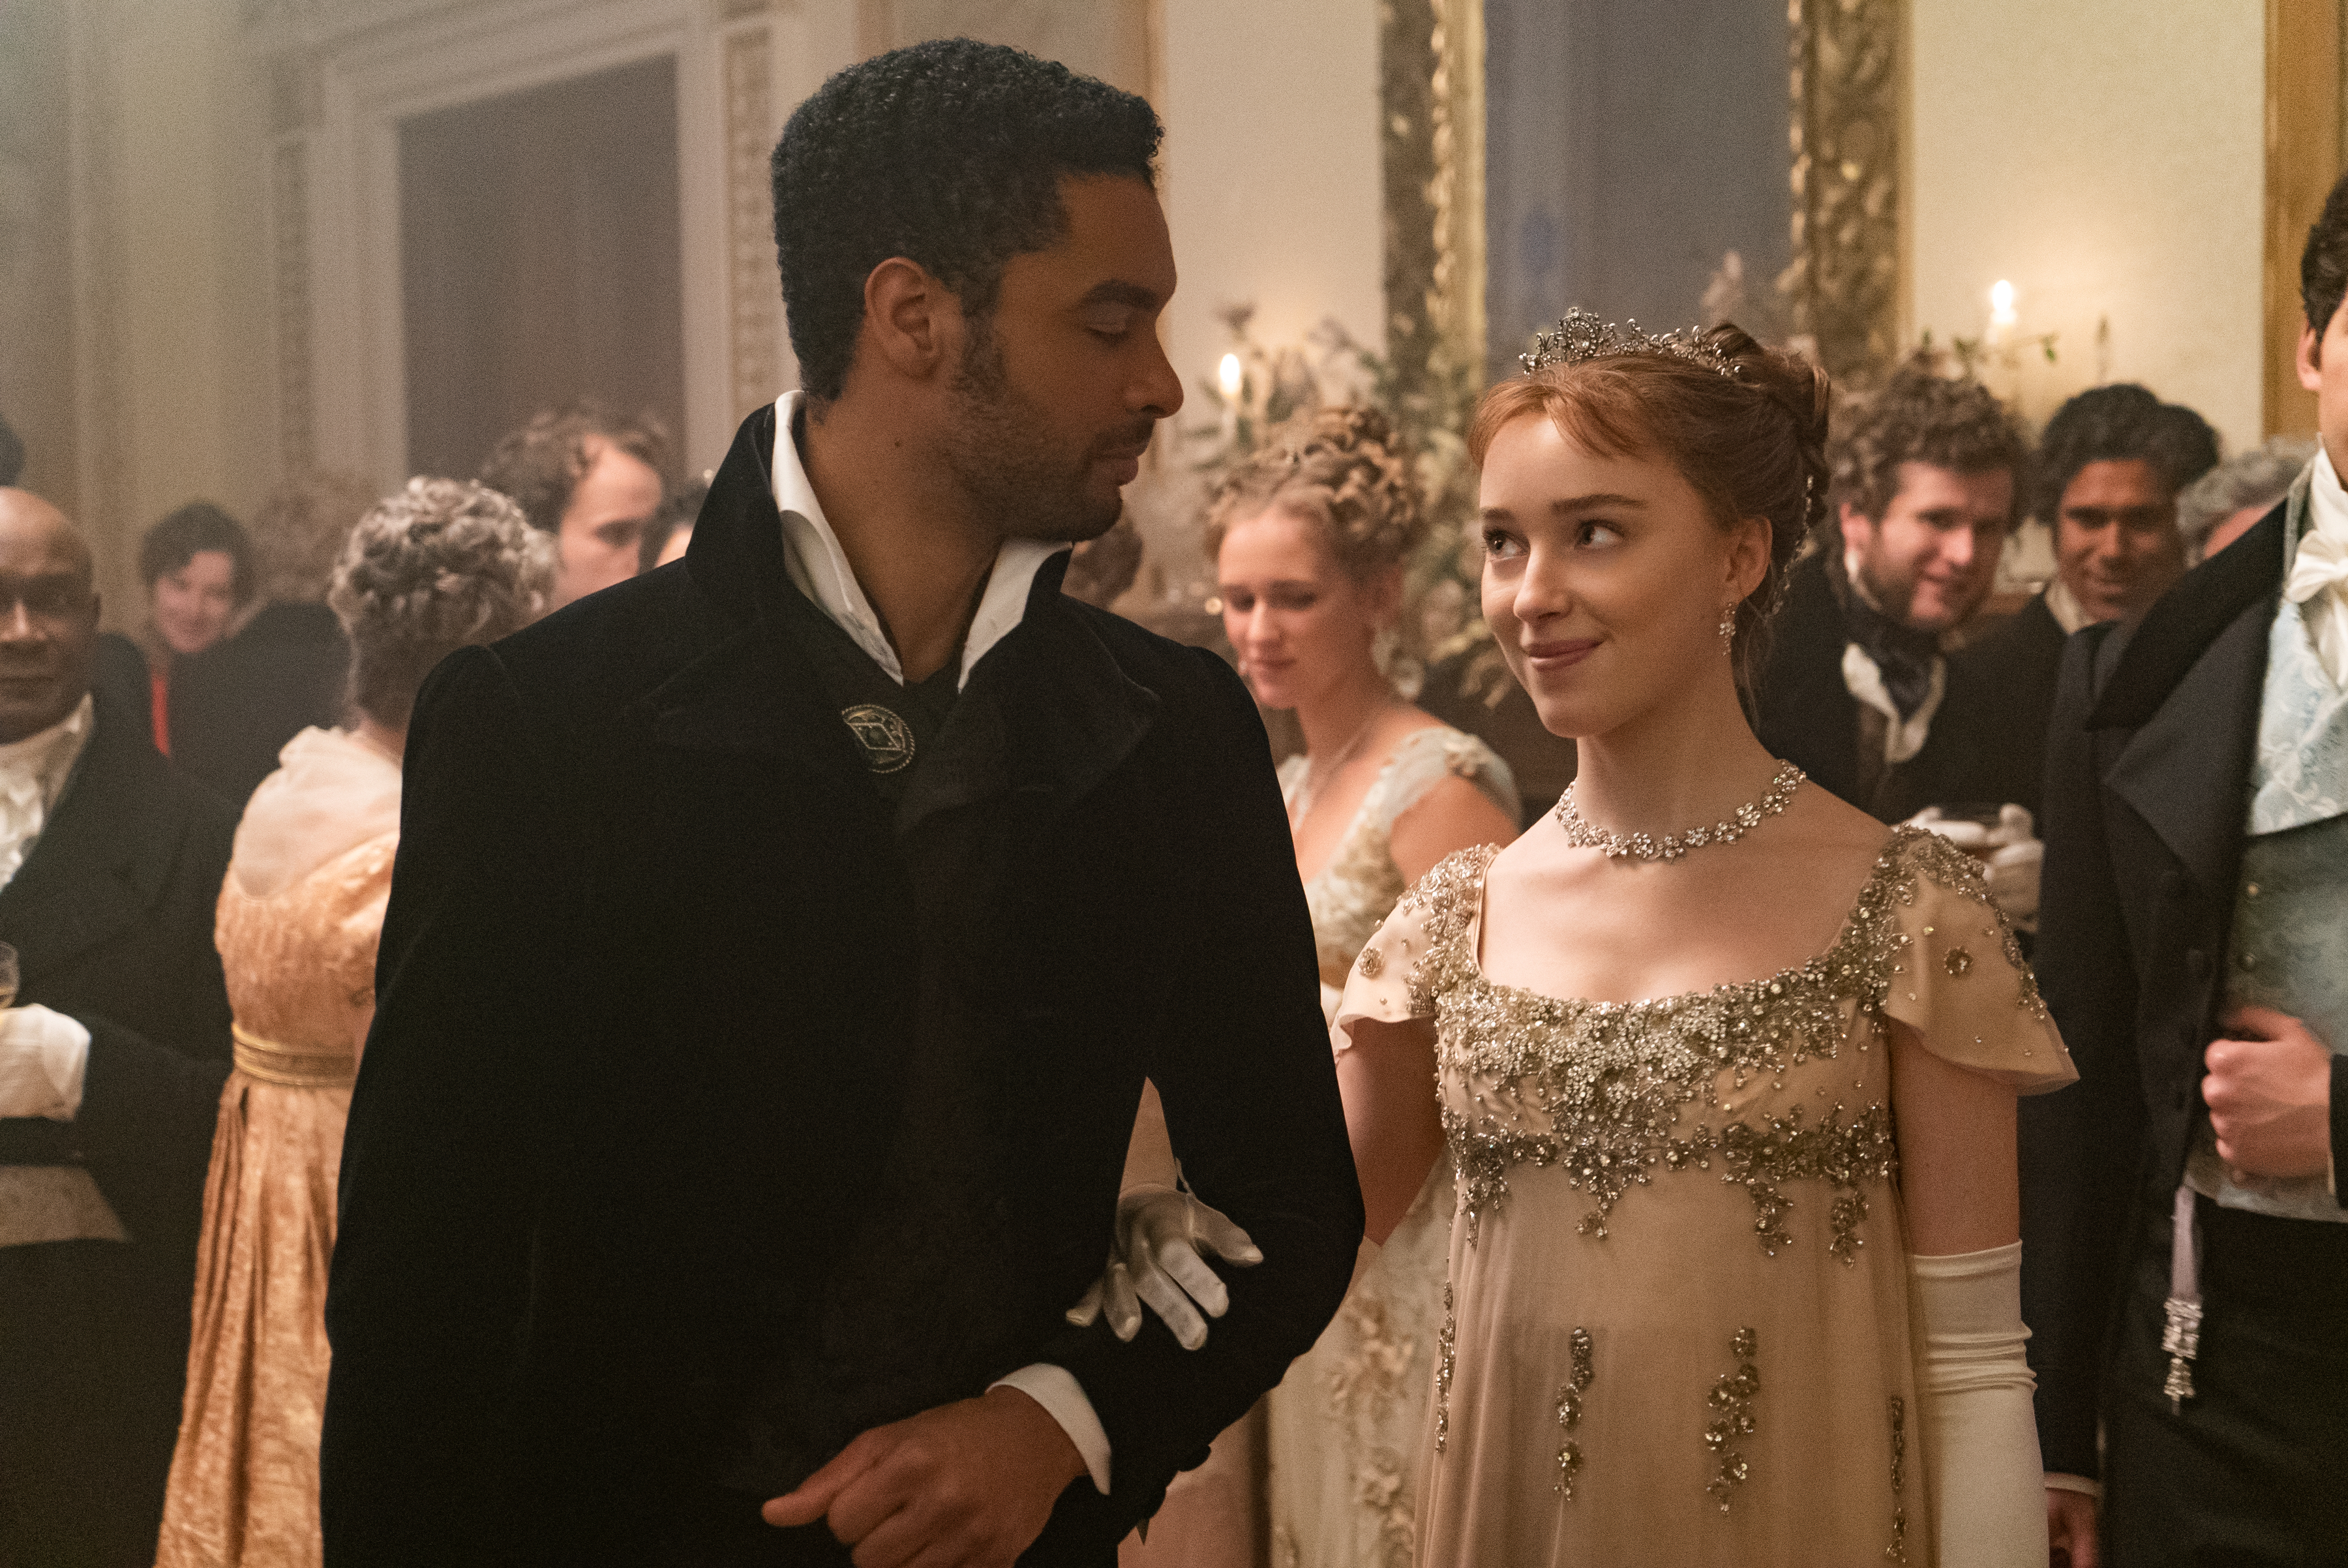 'Bridgerton' casts Simone Ashley as Lord Anthony's love interest